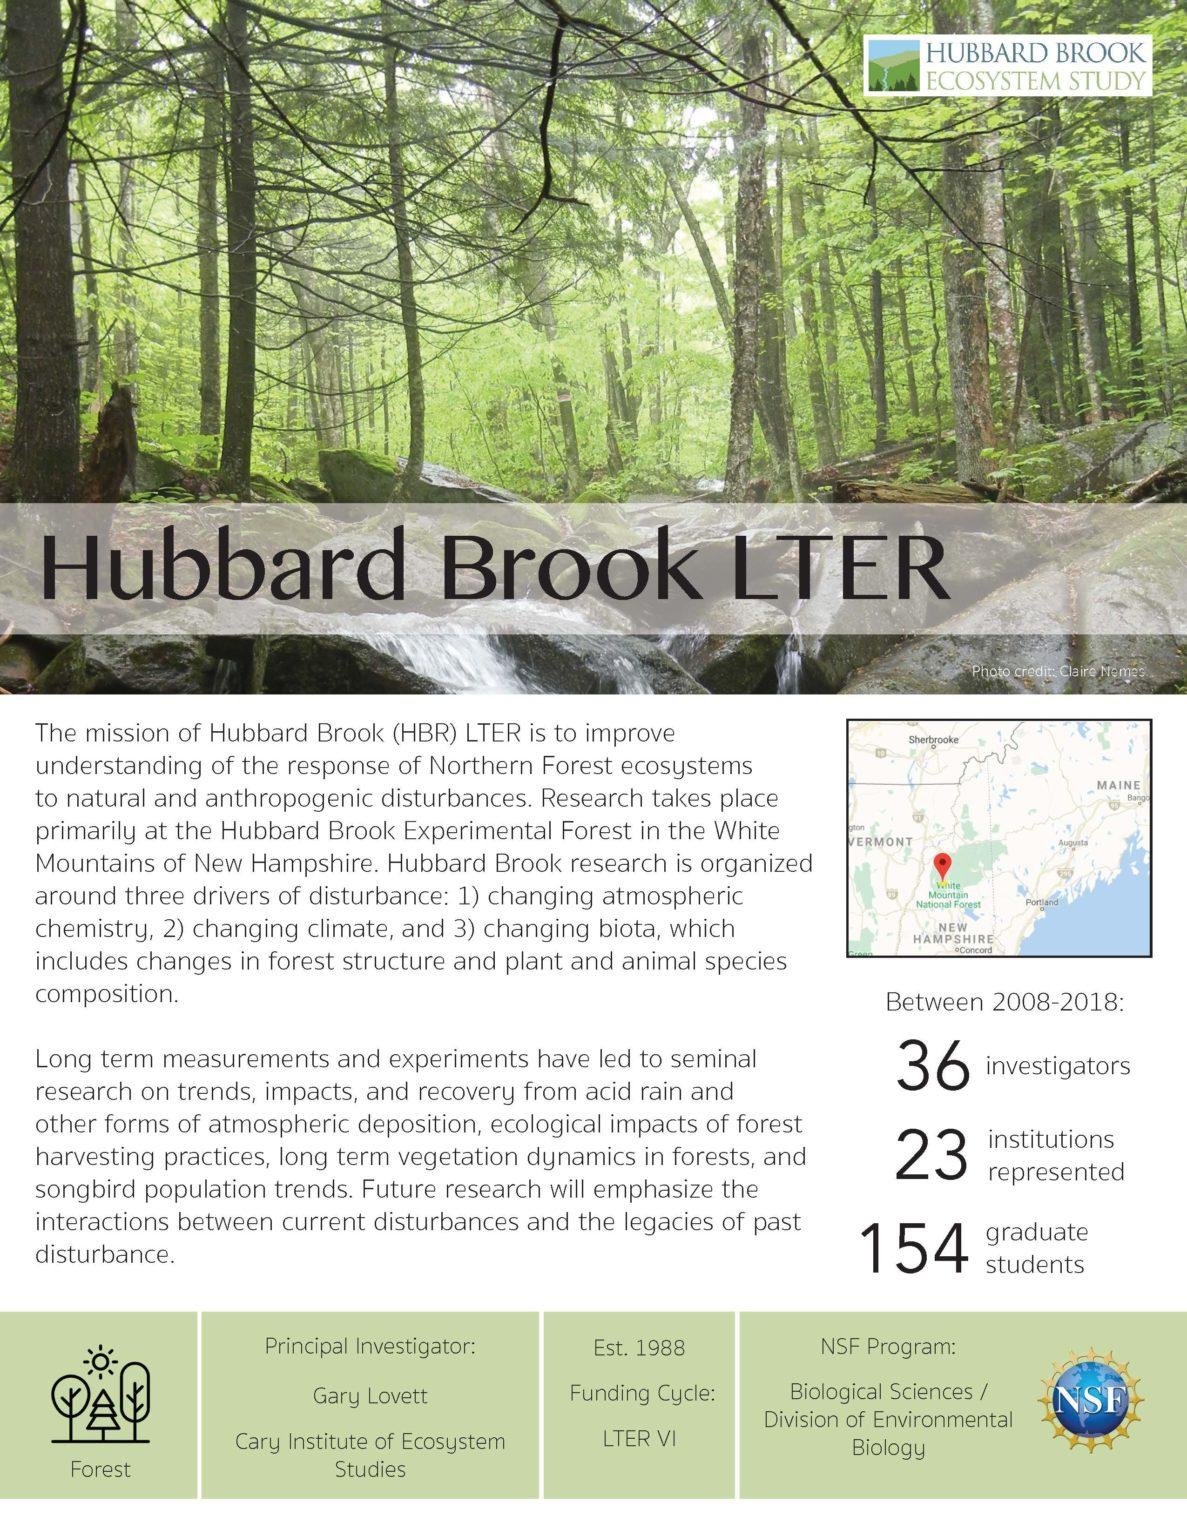 Hubbard Brook LTER site brief 2019